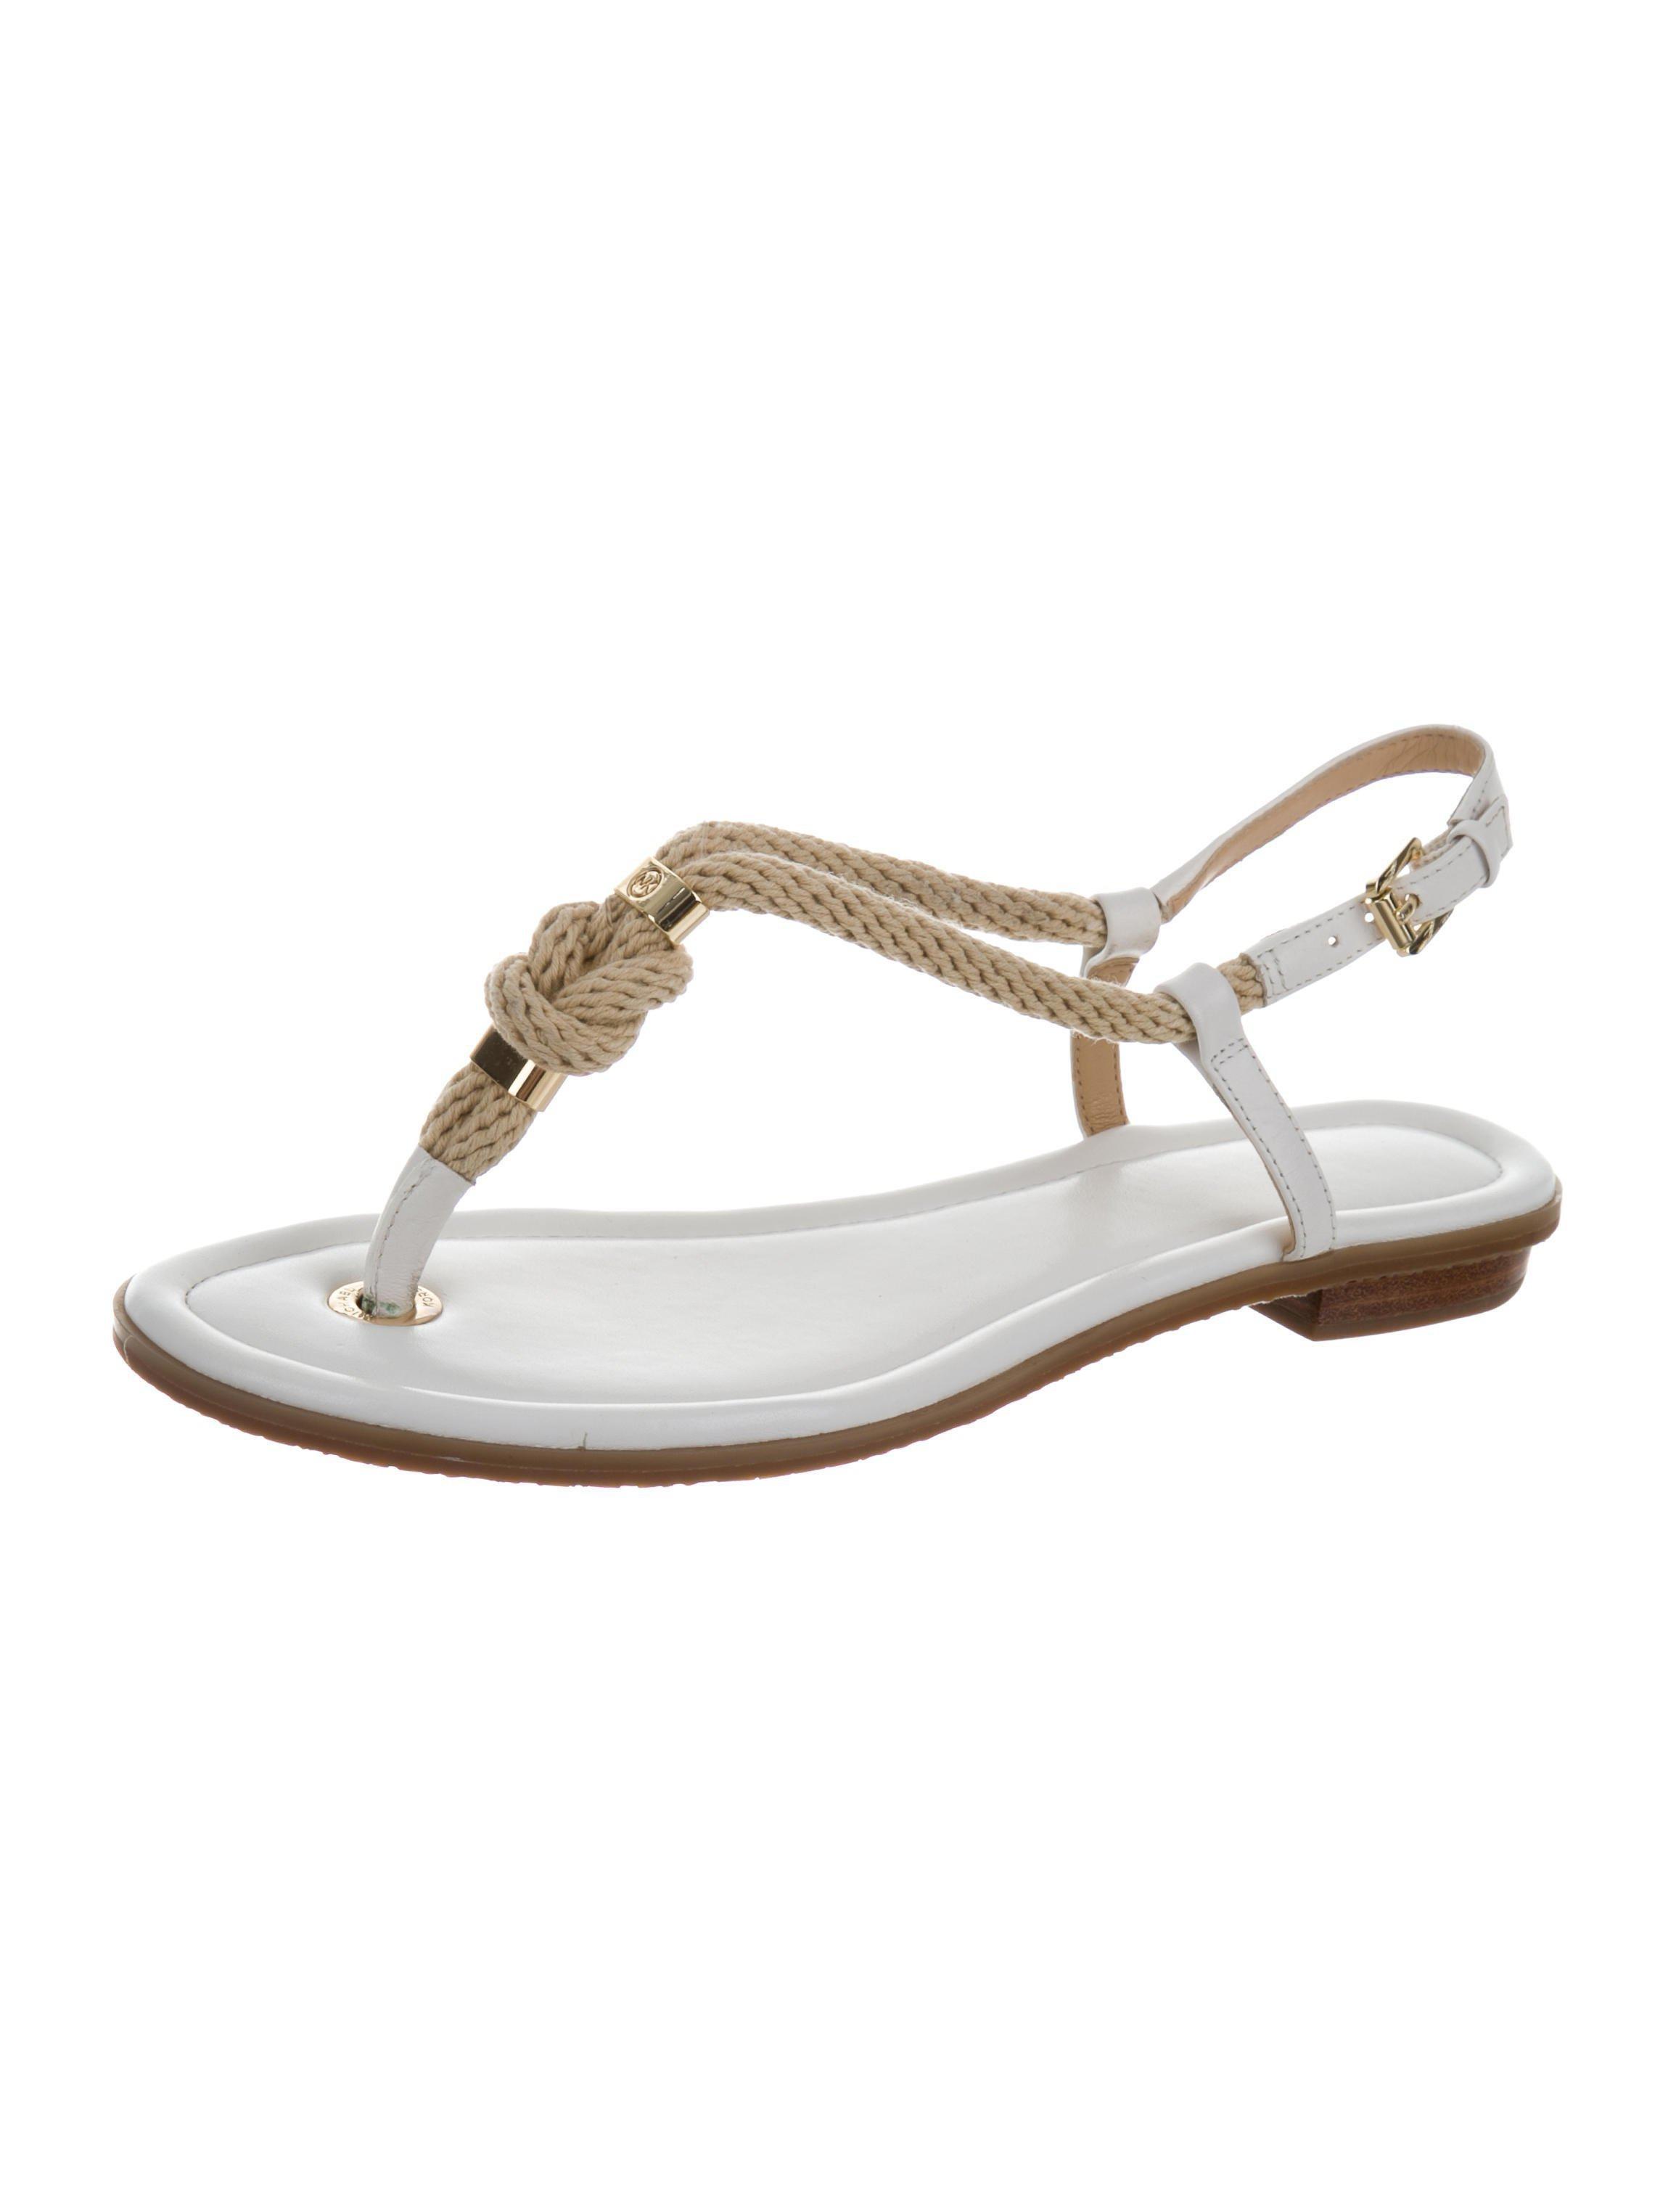 c310faf67e17 Michael Kors - Metallic Logo Thong Sandals White - Lyst. View fullscreen